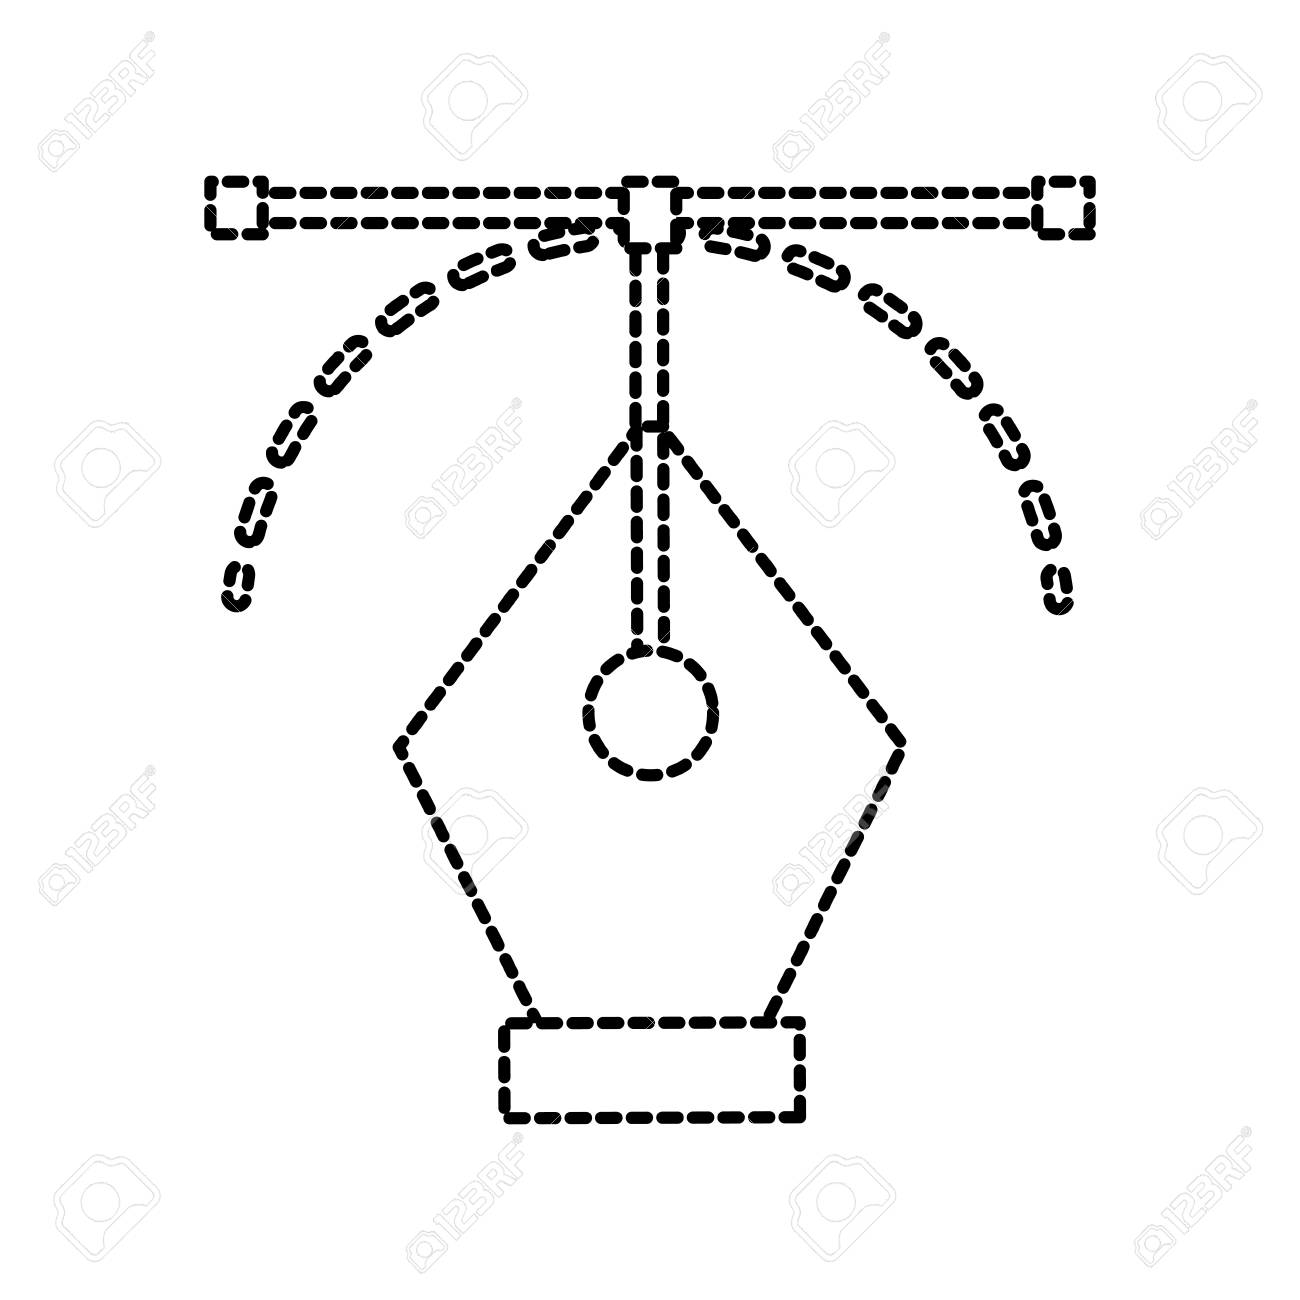 graphic design pen tool curve control vector illustration